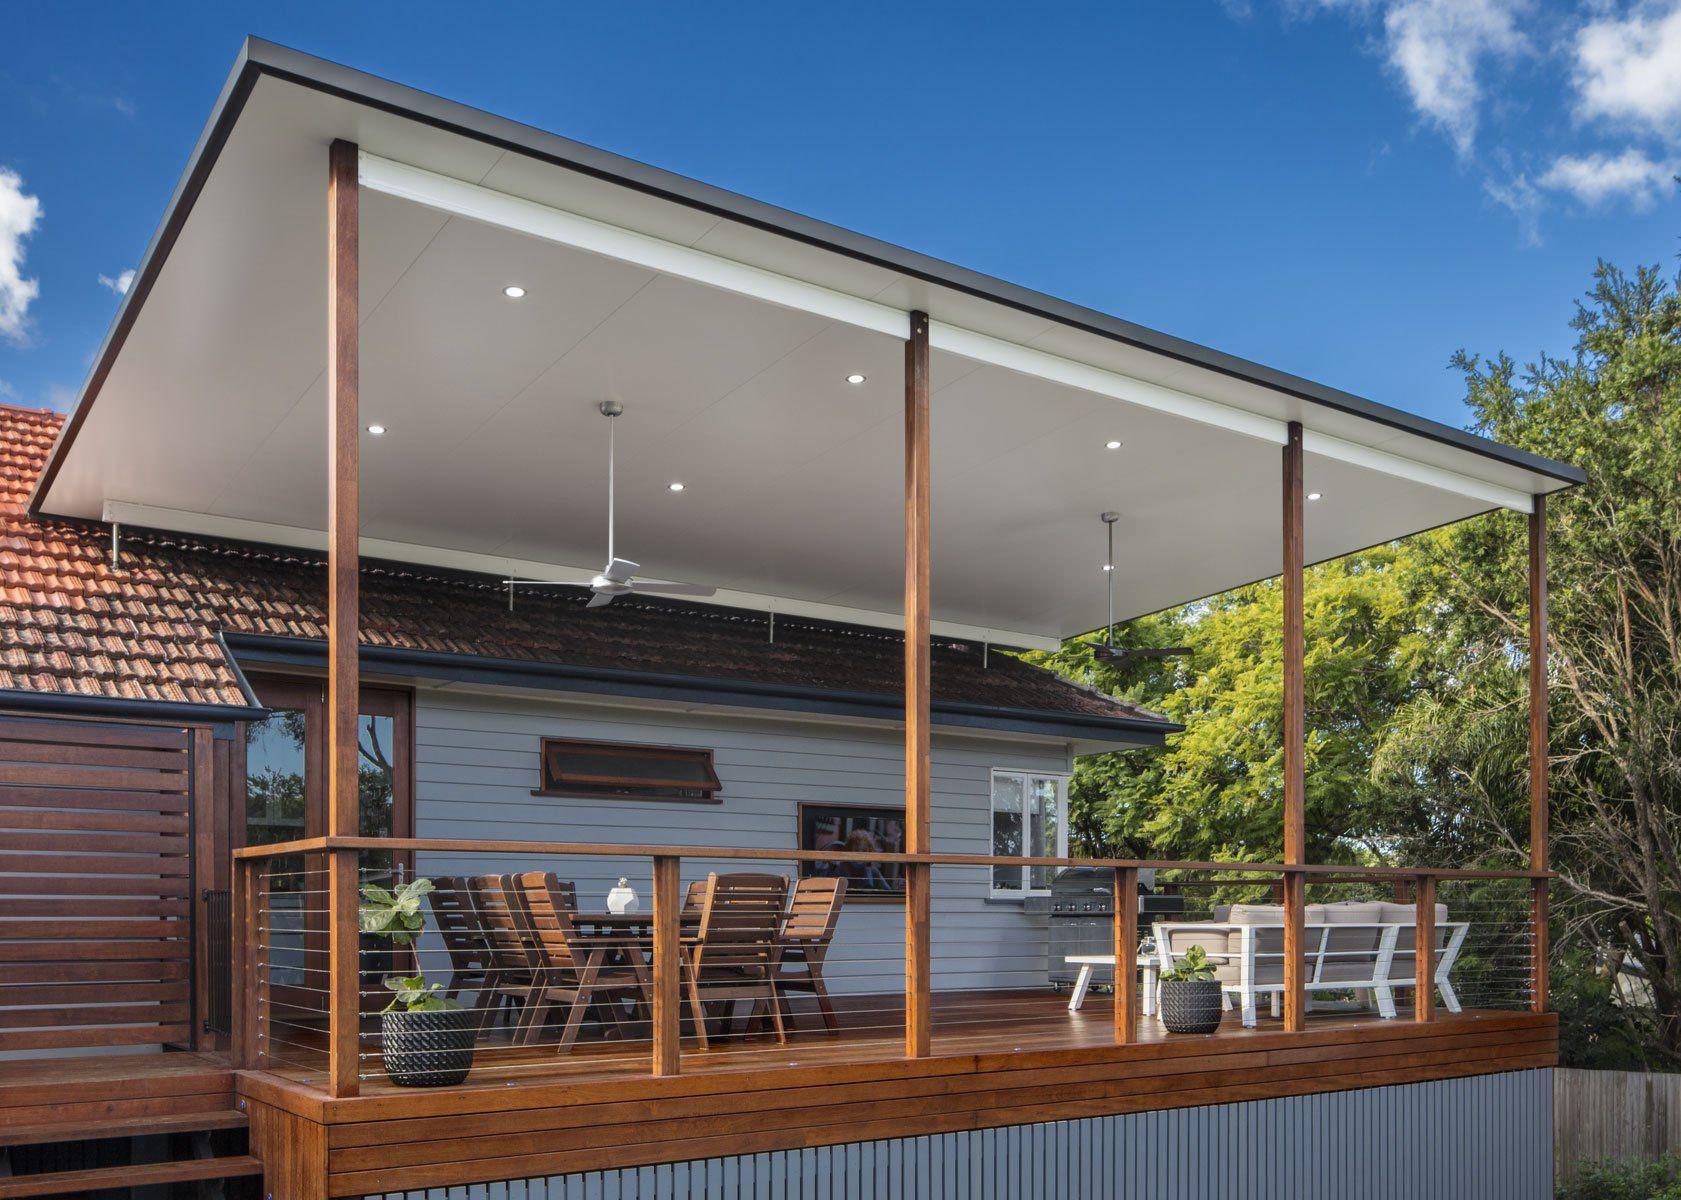 Cooldek Corrugated In 2020 Pergola Outdoor Living Outdoor Awnings Outdoor Pergola